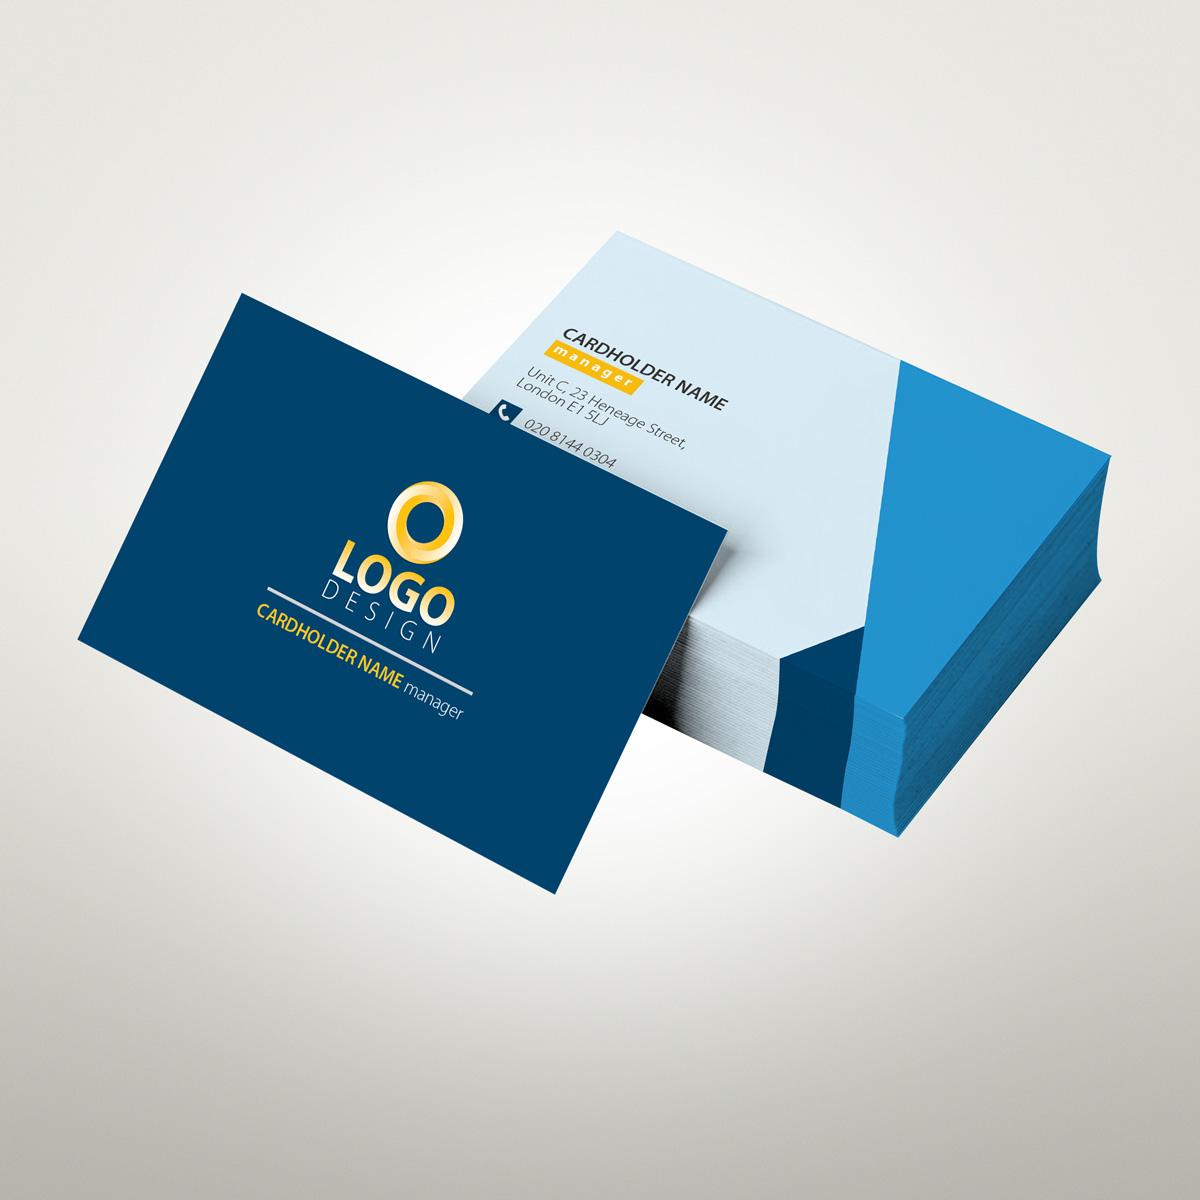 instant print 1000 business card trade price company london e1 near me